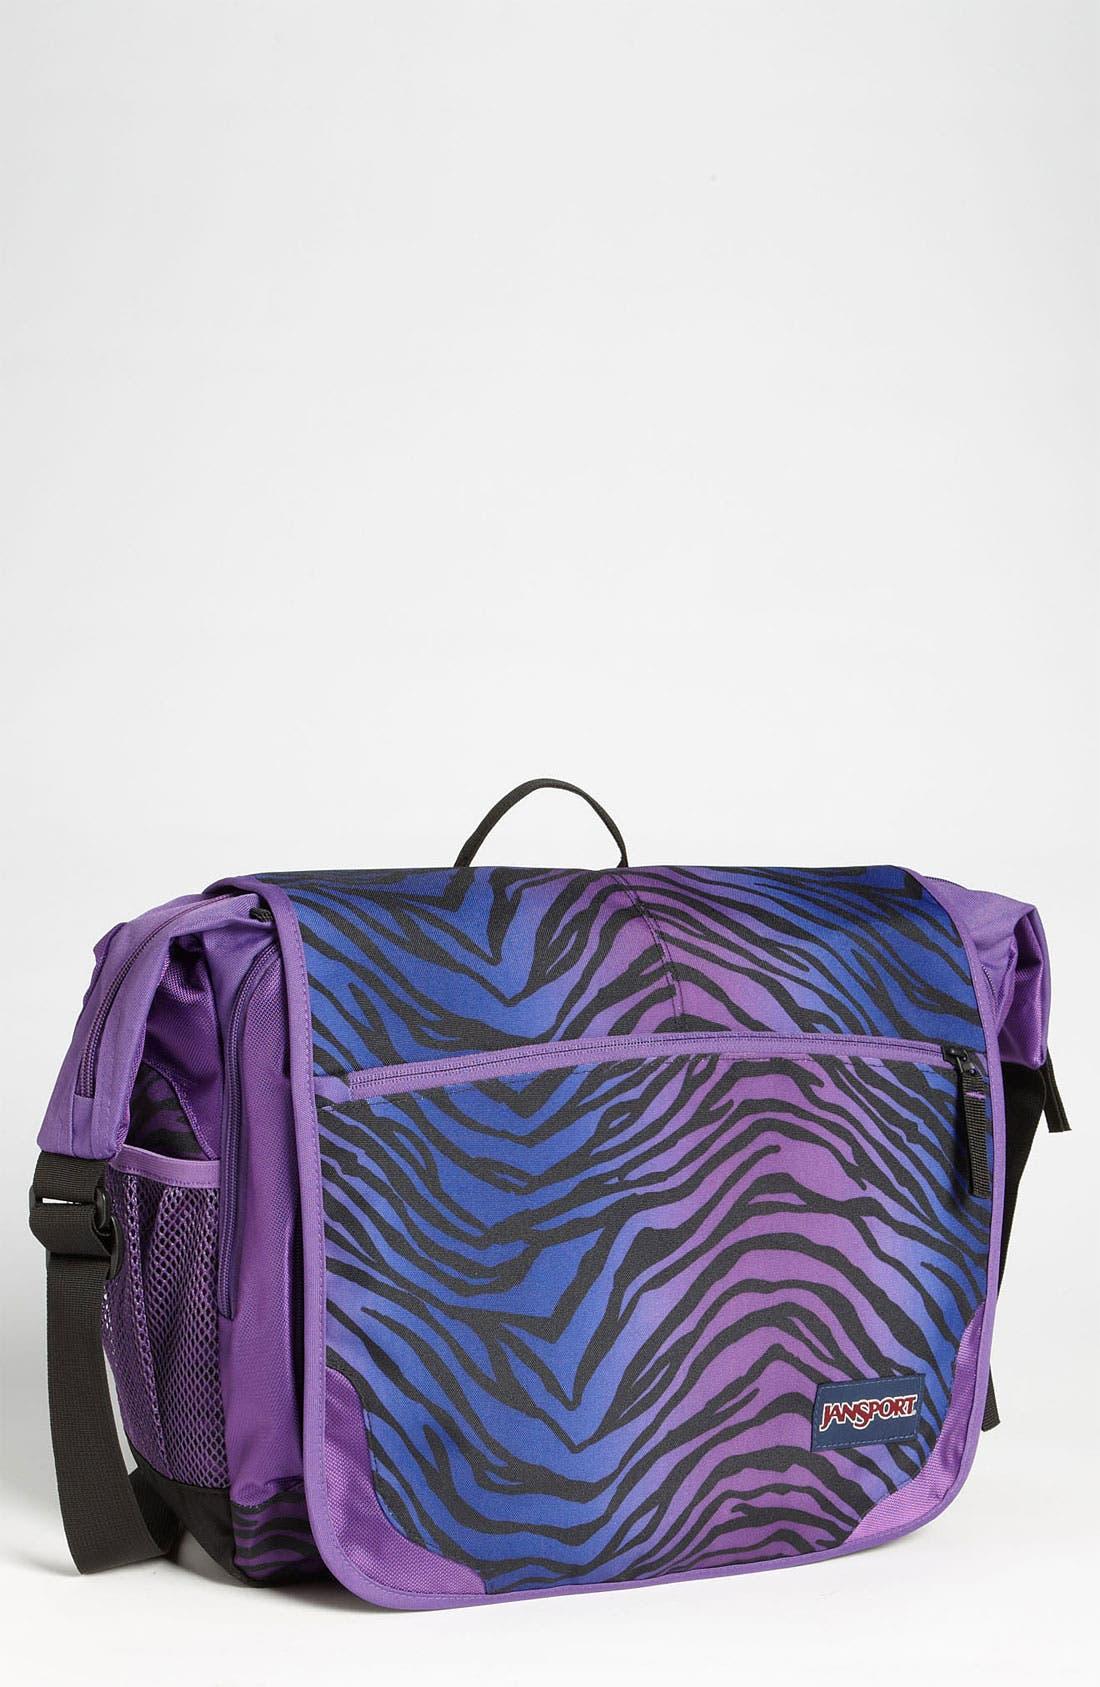 Alternate Image 1 Selected - Jansport 'Elephunk' Computer Crossbody Bag (15 inch) (Girls)